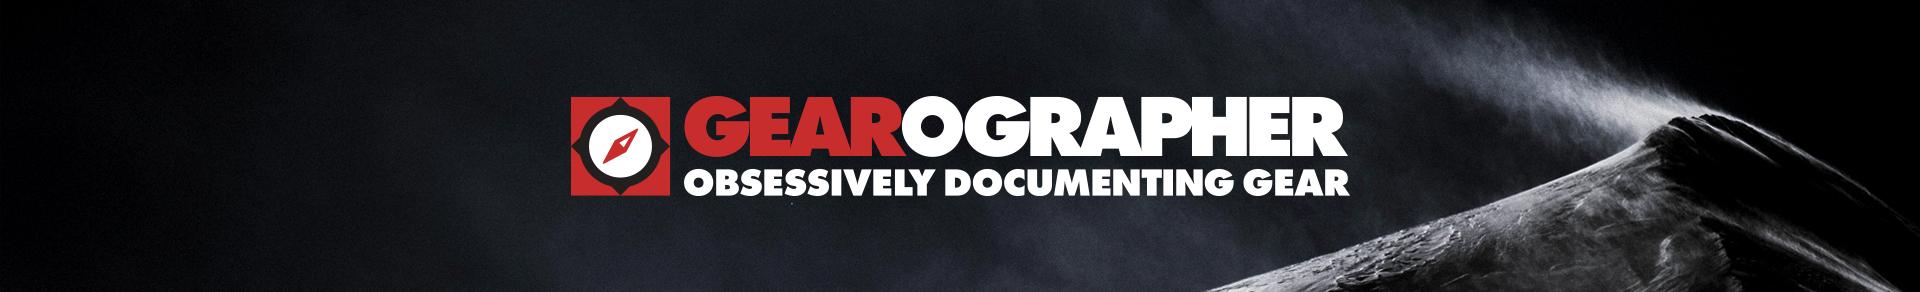 GEAROGRAPHER